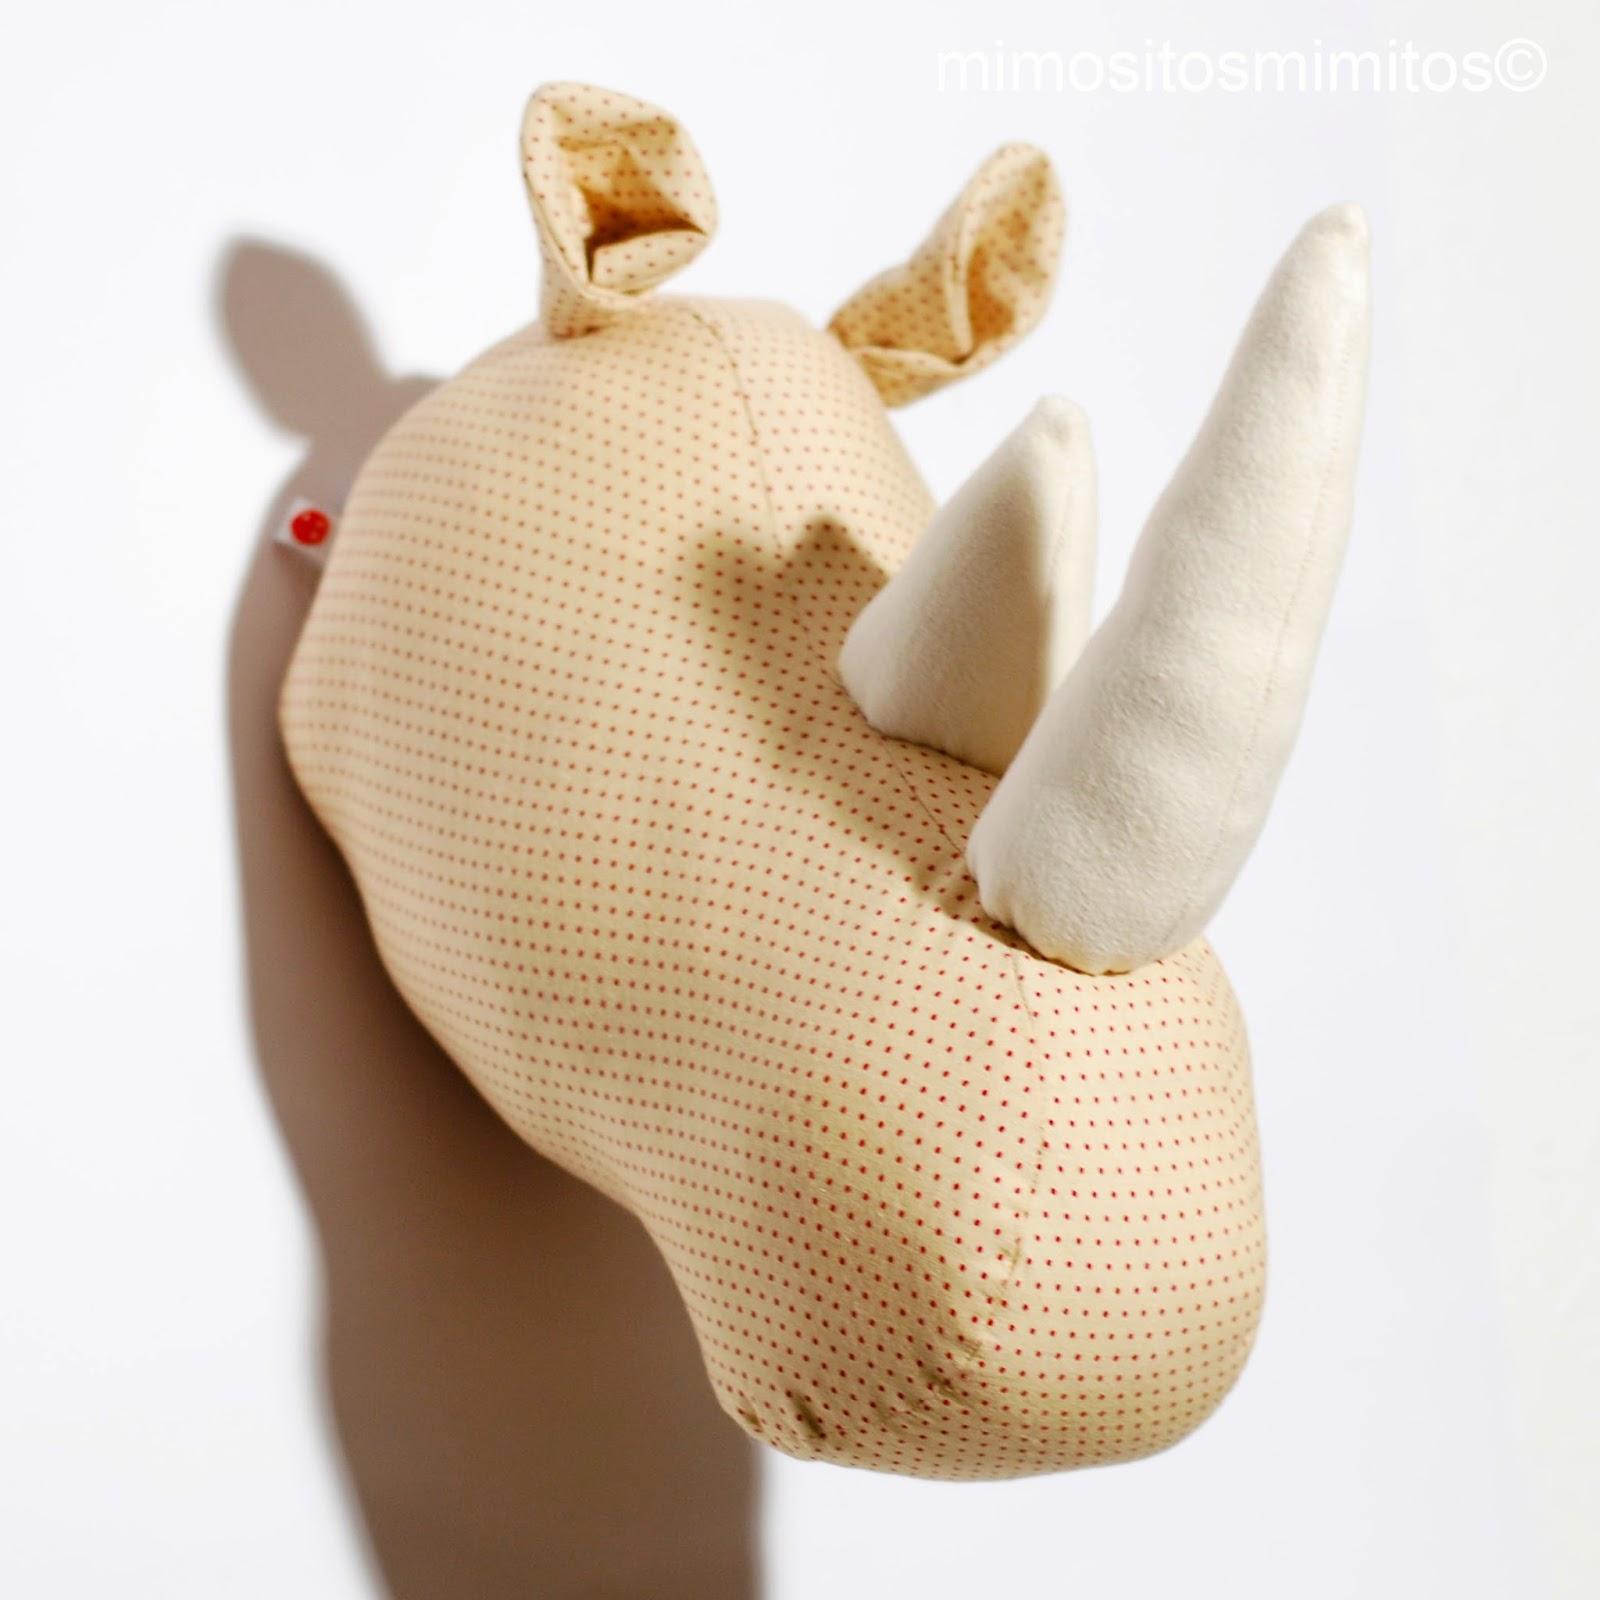 Cabeza rinoceronte tela decoraci n interiorismo casa decoration home hecho a mano handmade rhino - Cabezas animales tela ...